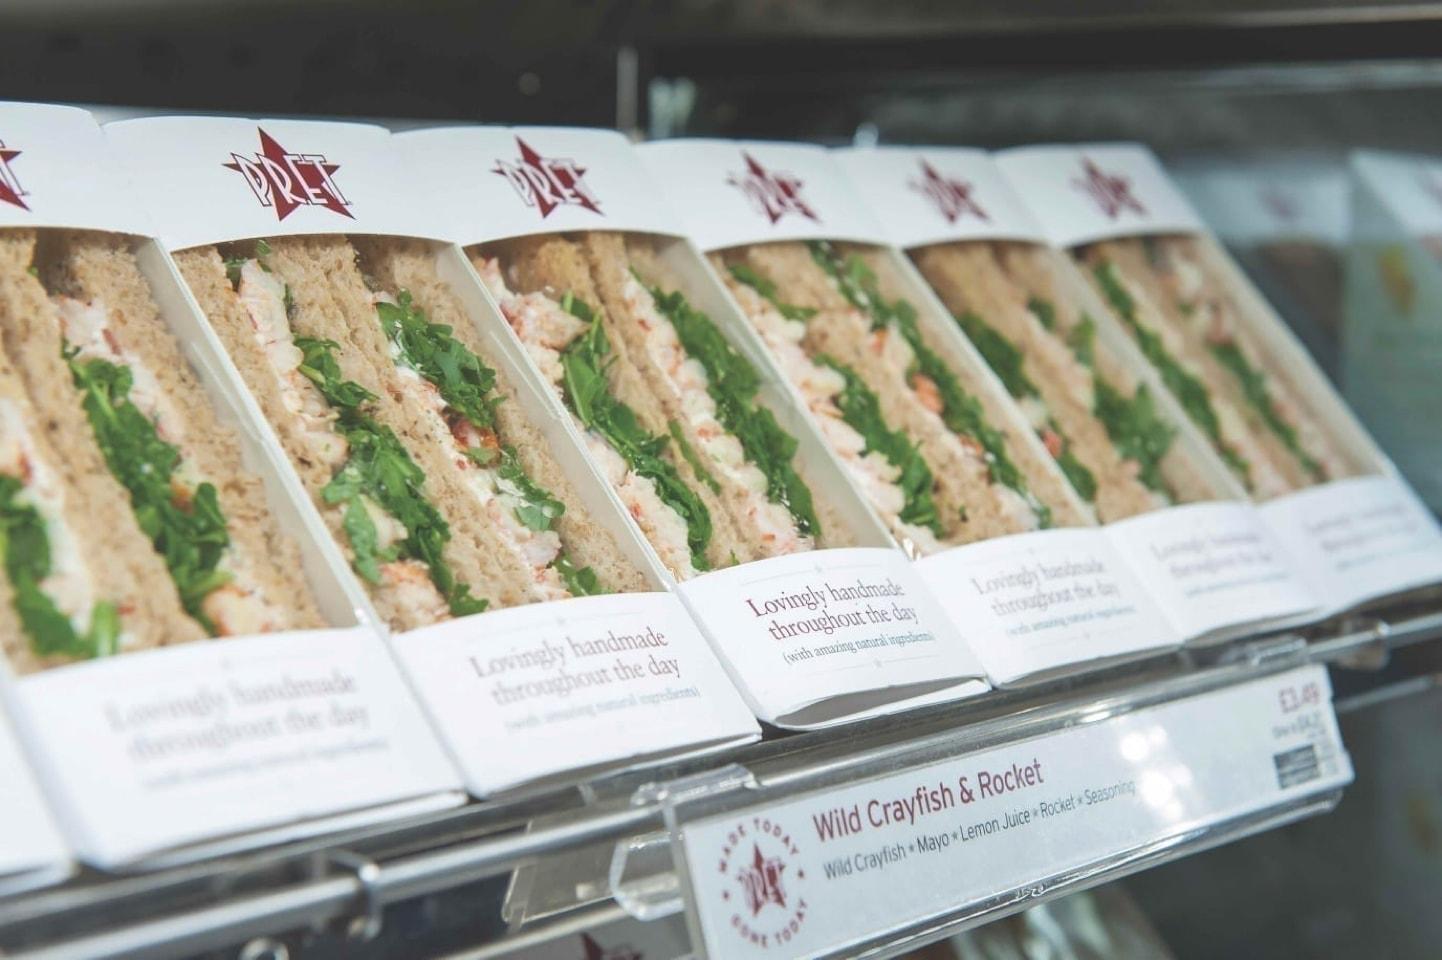 Pret - Ham and cheese Sandwich x 1